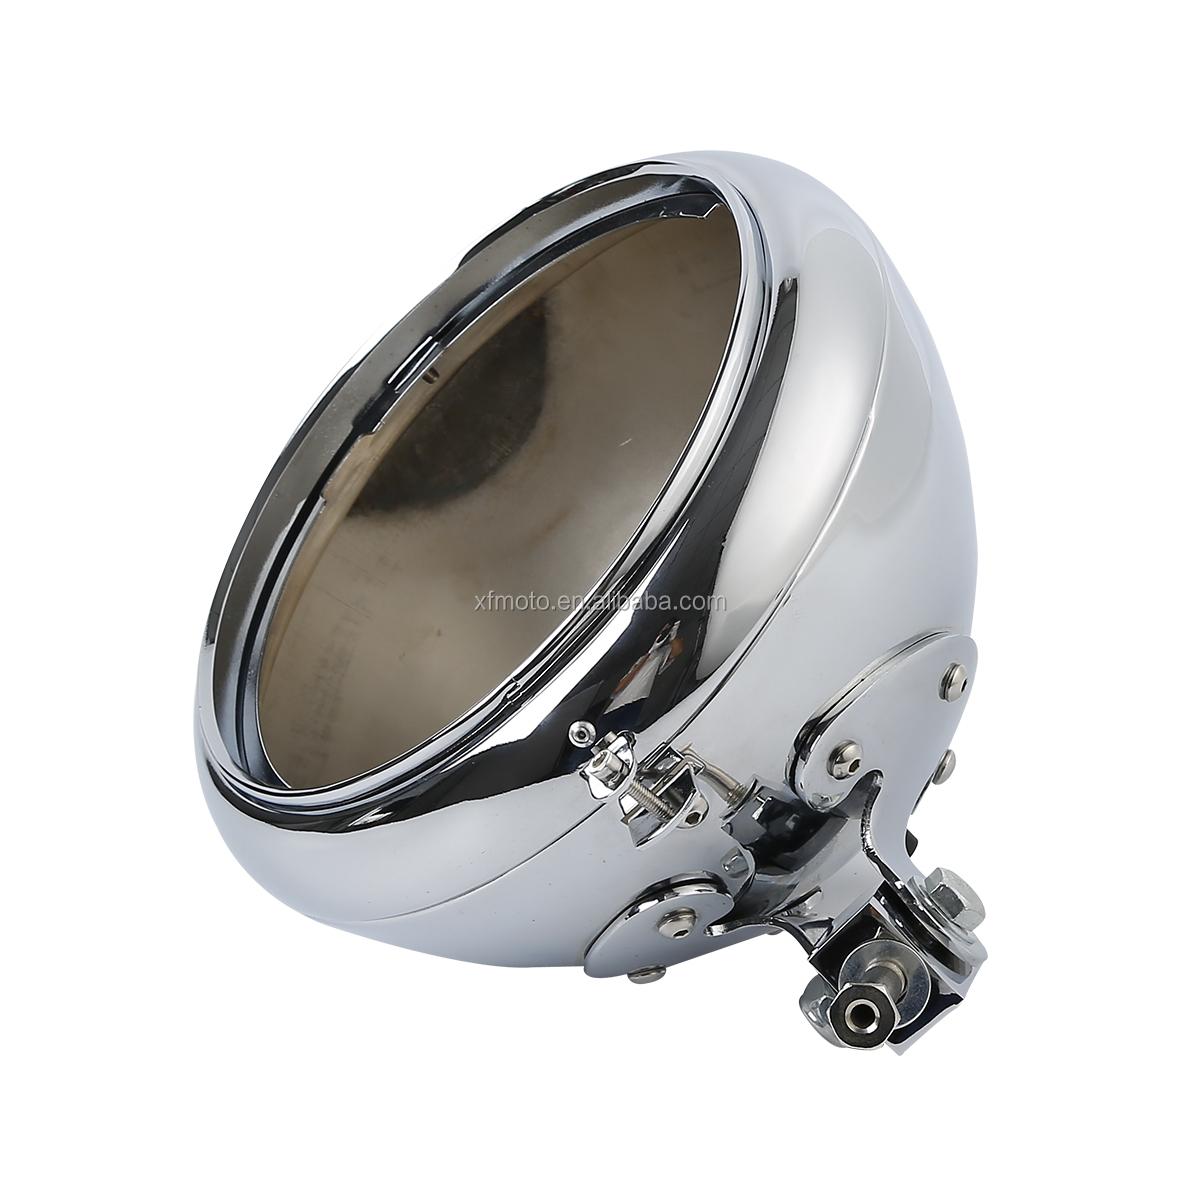 Harley Davidson FLST Headlight Shell Assembly 67789-91A W// Block Mount